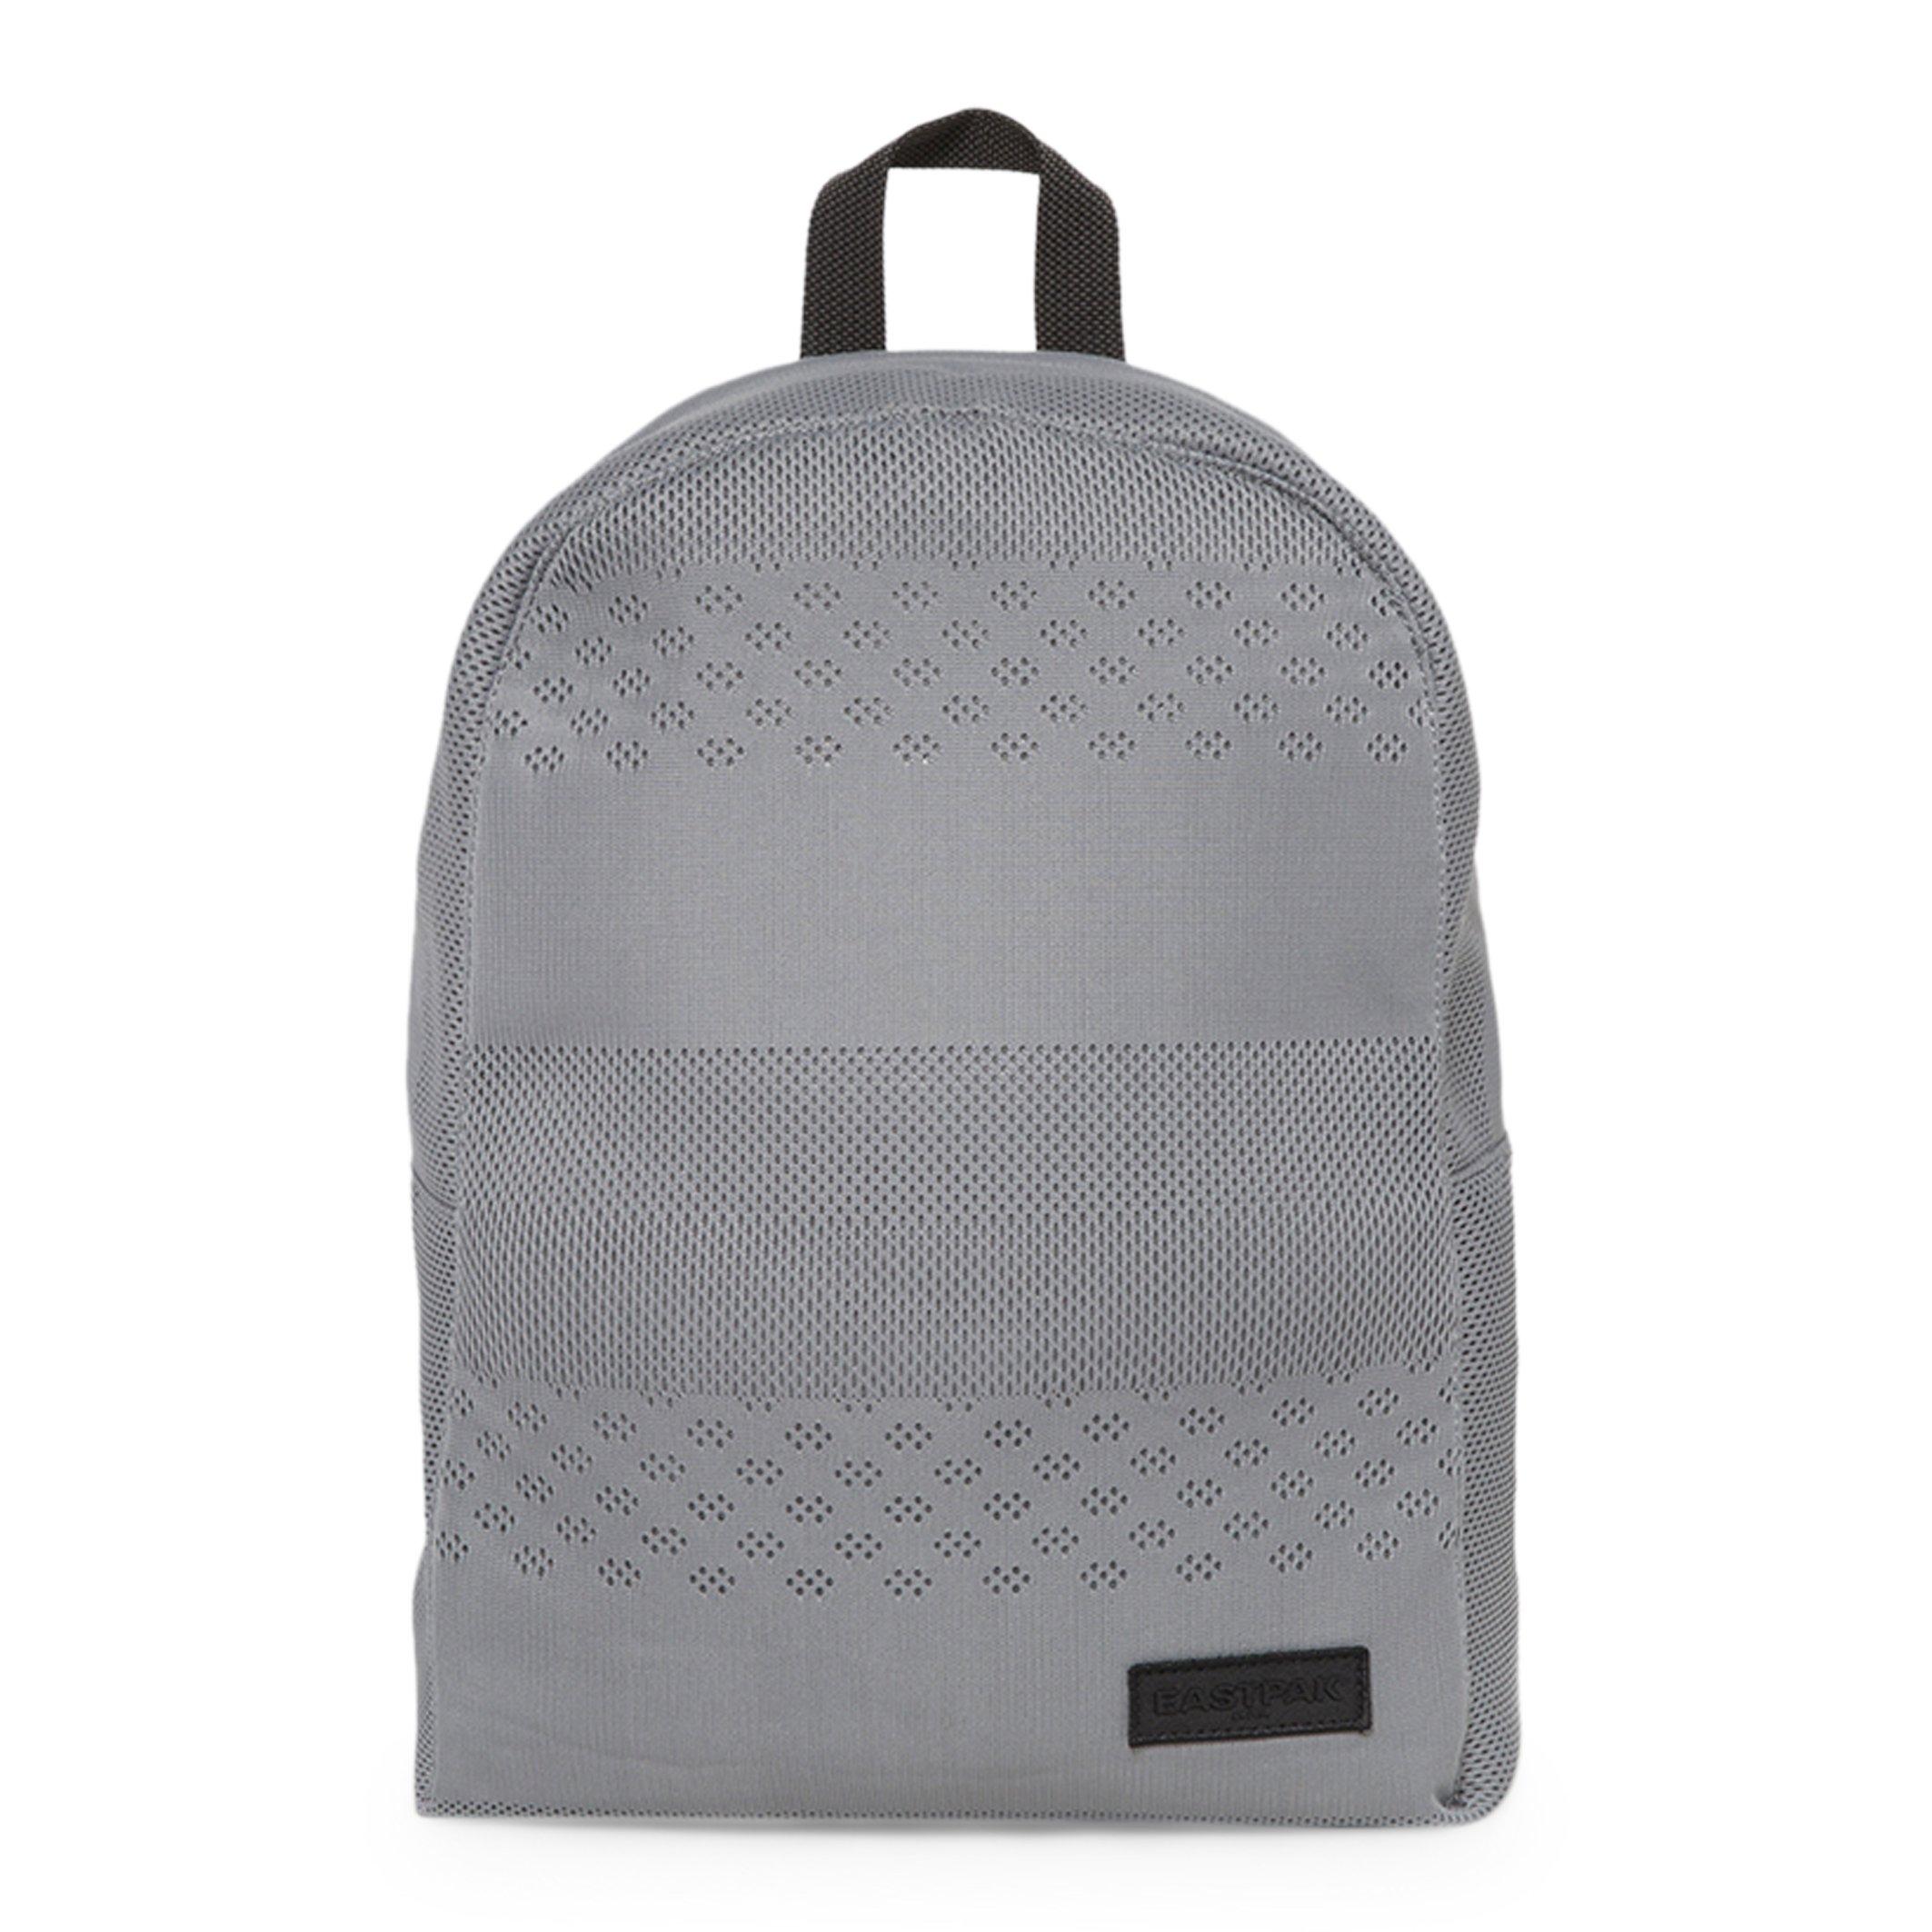 Eastpak Unsiex PADDED-PAKR Backpack Various Colours EK620_C39 - grey NOSIZE